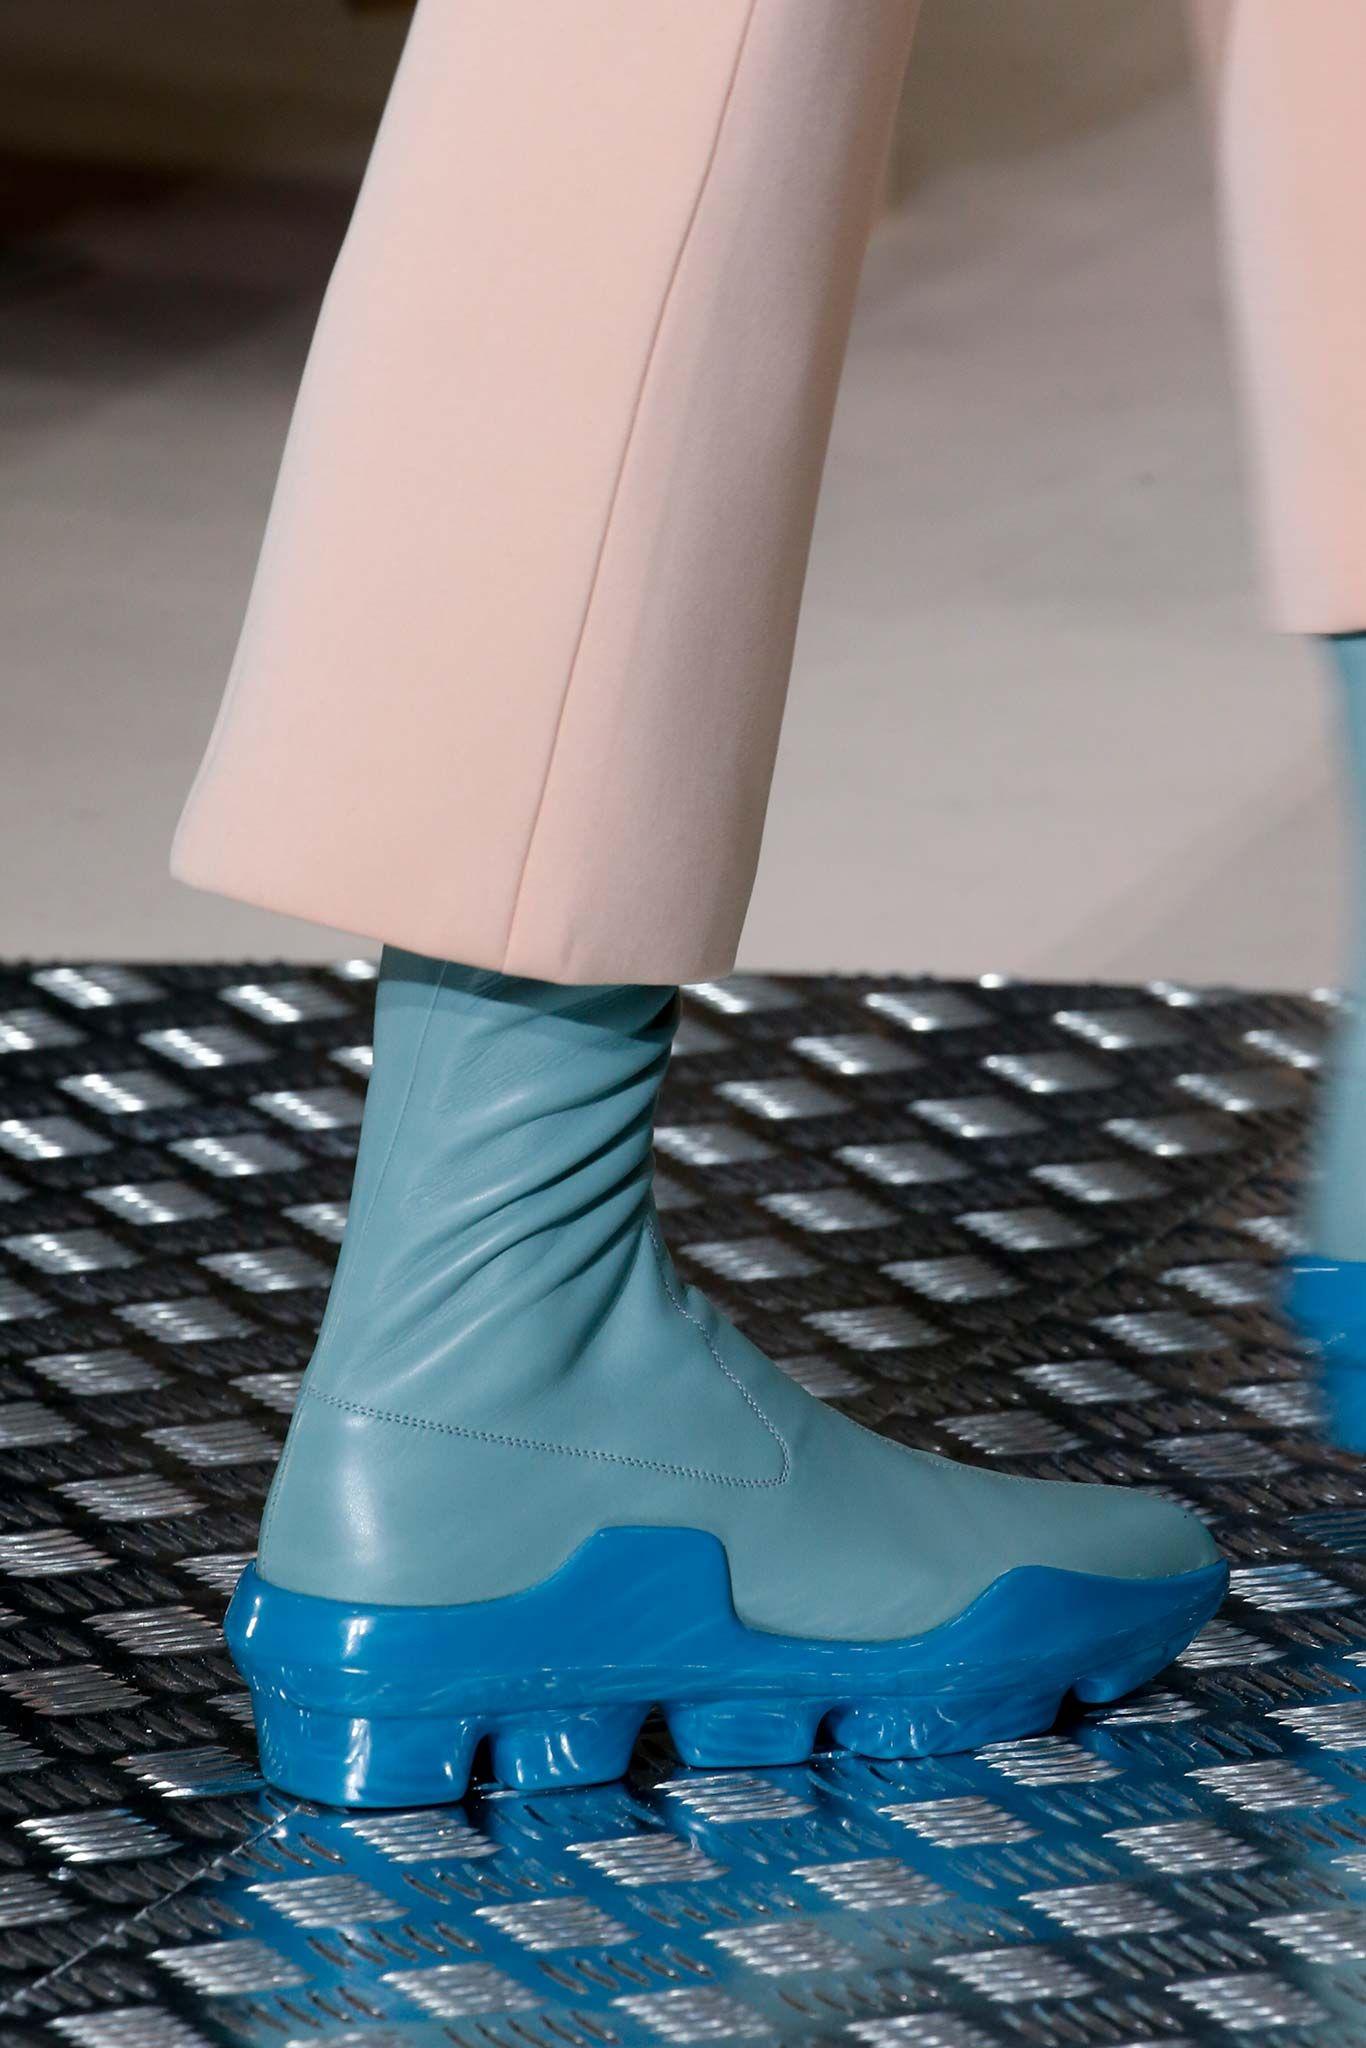 de67f8ec38e Designer Fashion - Farfetch. The World Through Fashion. See detail photos  for Prada Fall 2015 Ready-to-Wear collection. Bag AccessoriesFall ...